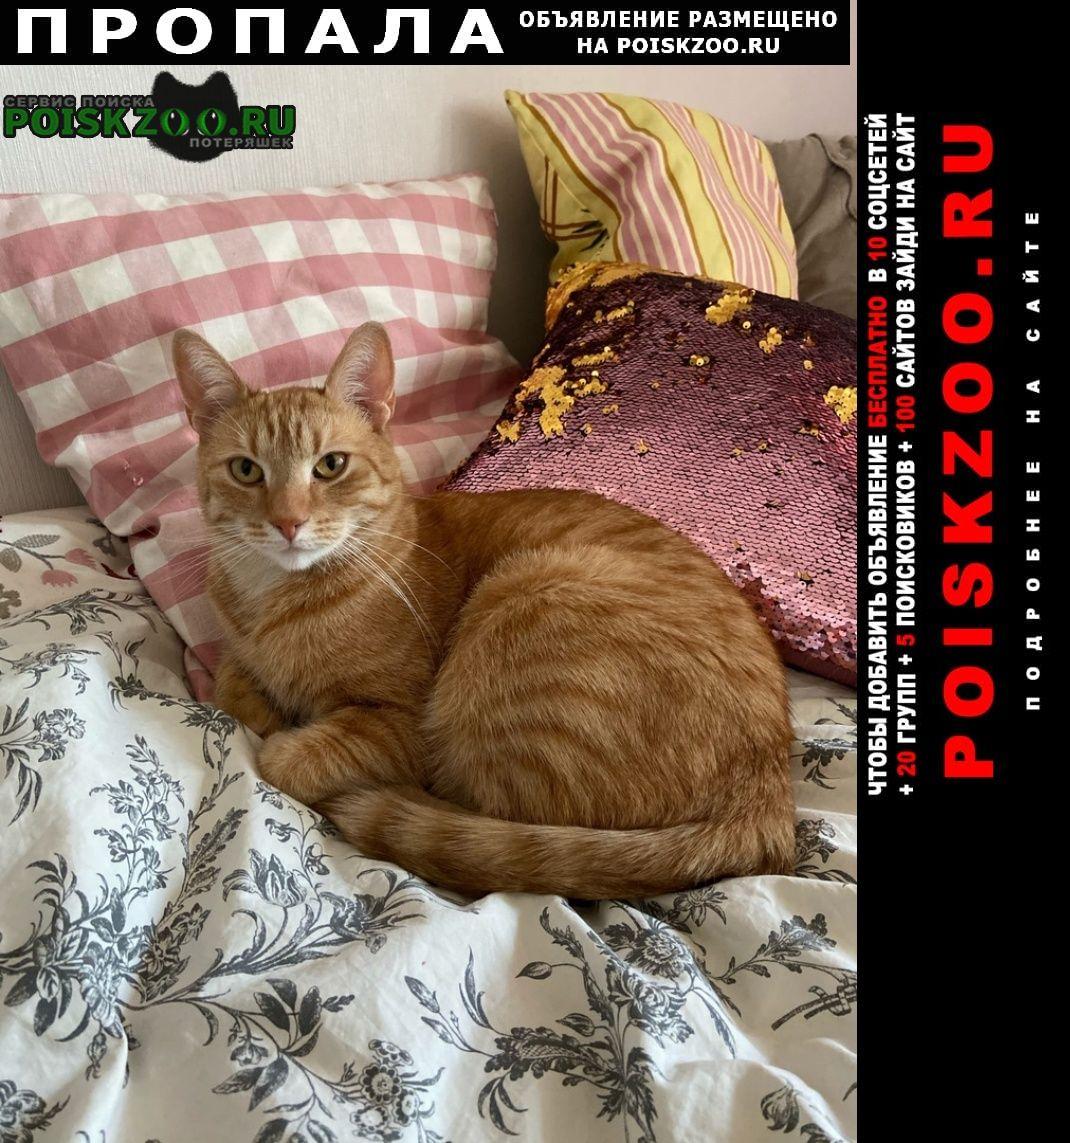 Санкт-Петербург Пропала кошка рыжий кот